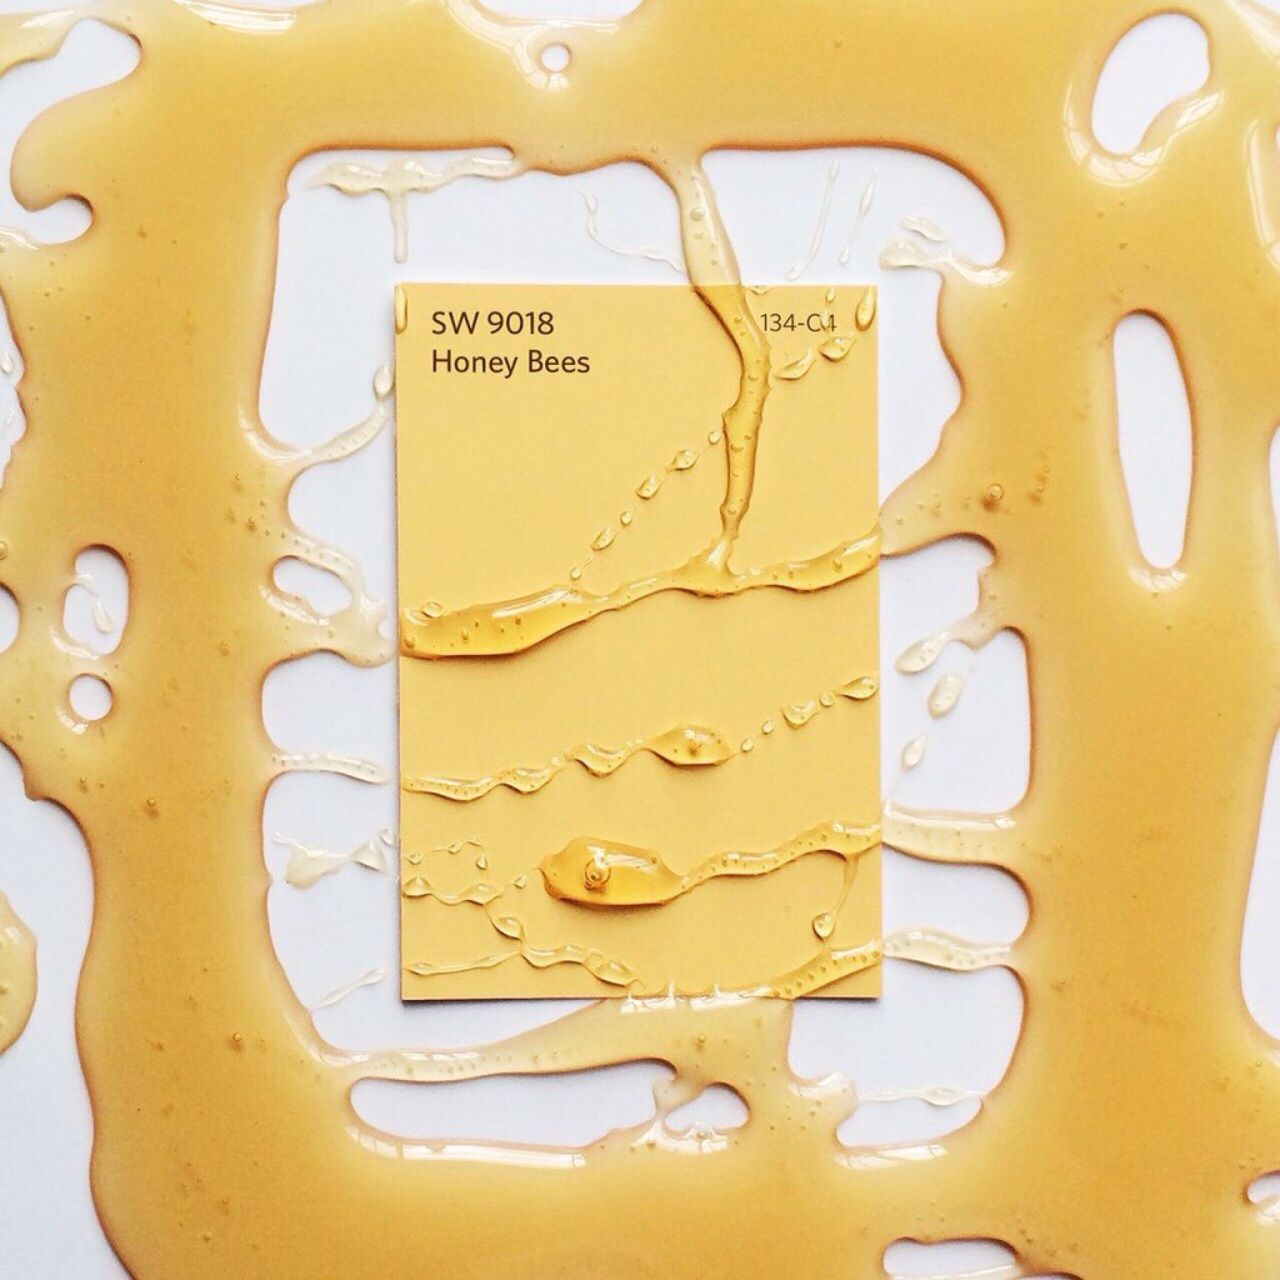 Aesthetic Wallpaper Yellow Honey